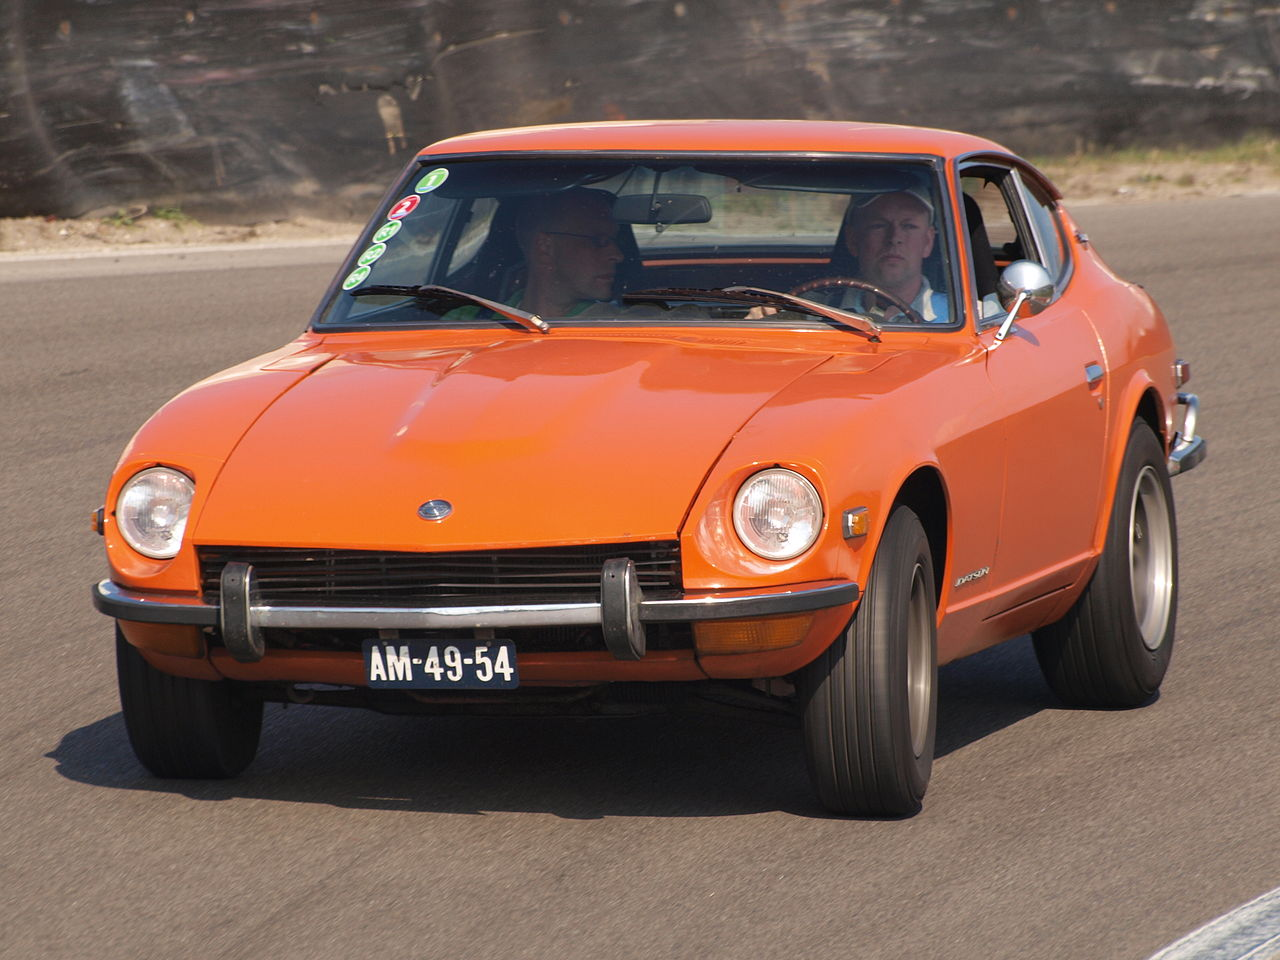 File:Datsun 240 Z Sport dutch licence registration AM-49 ...